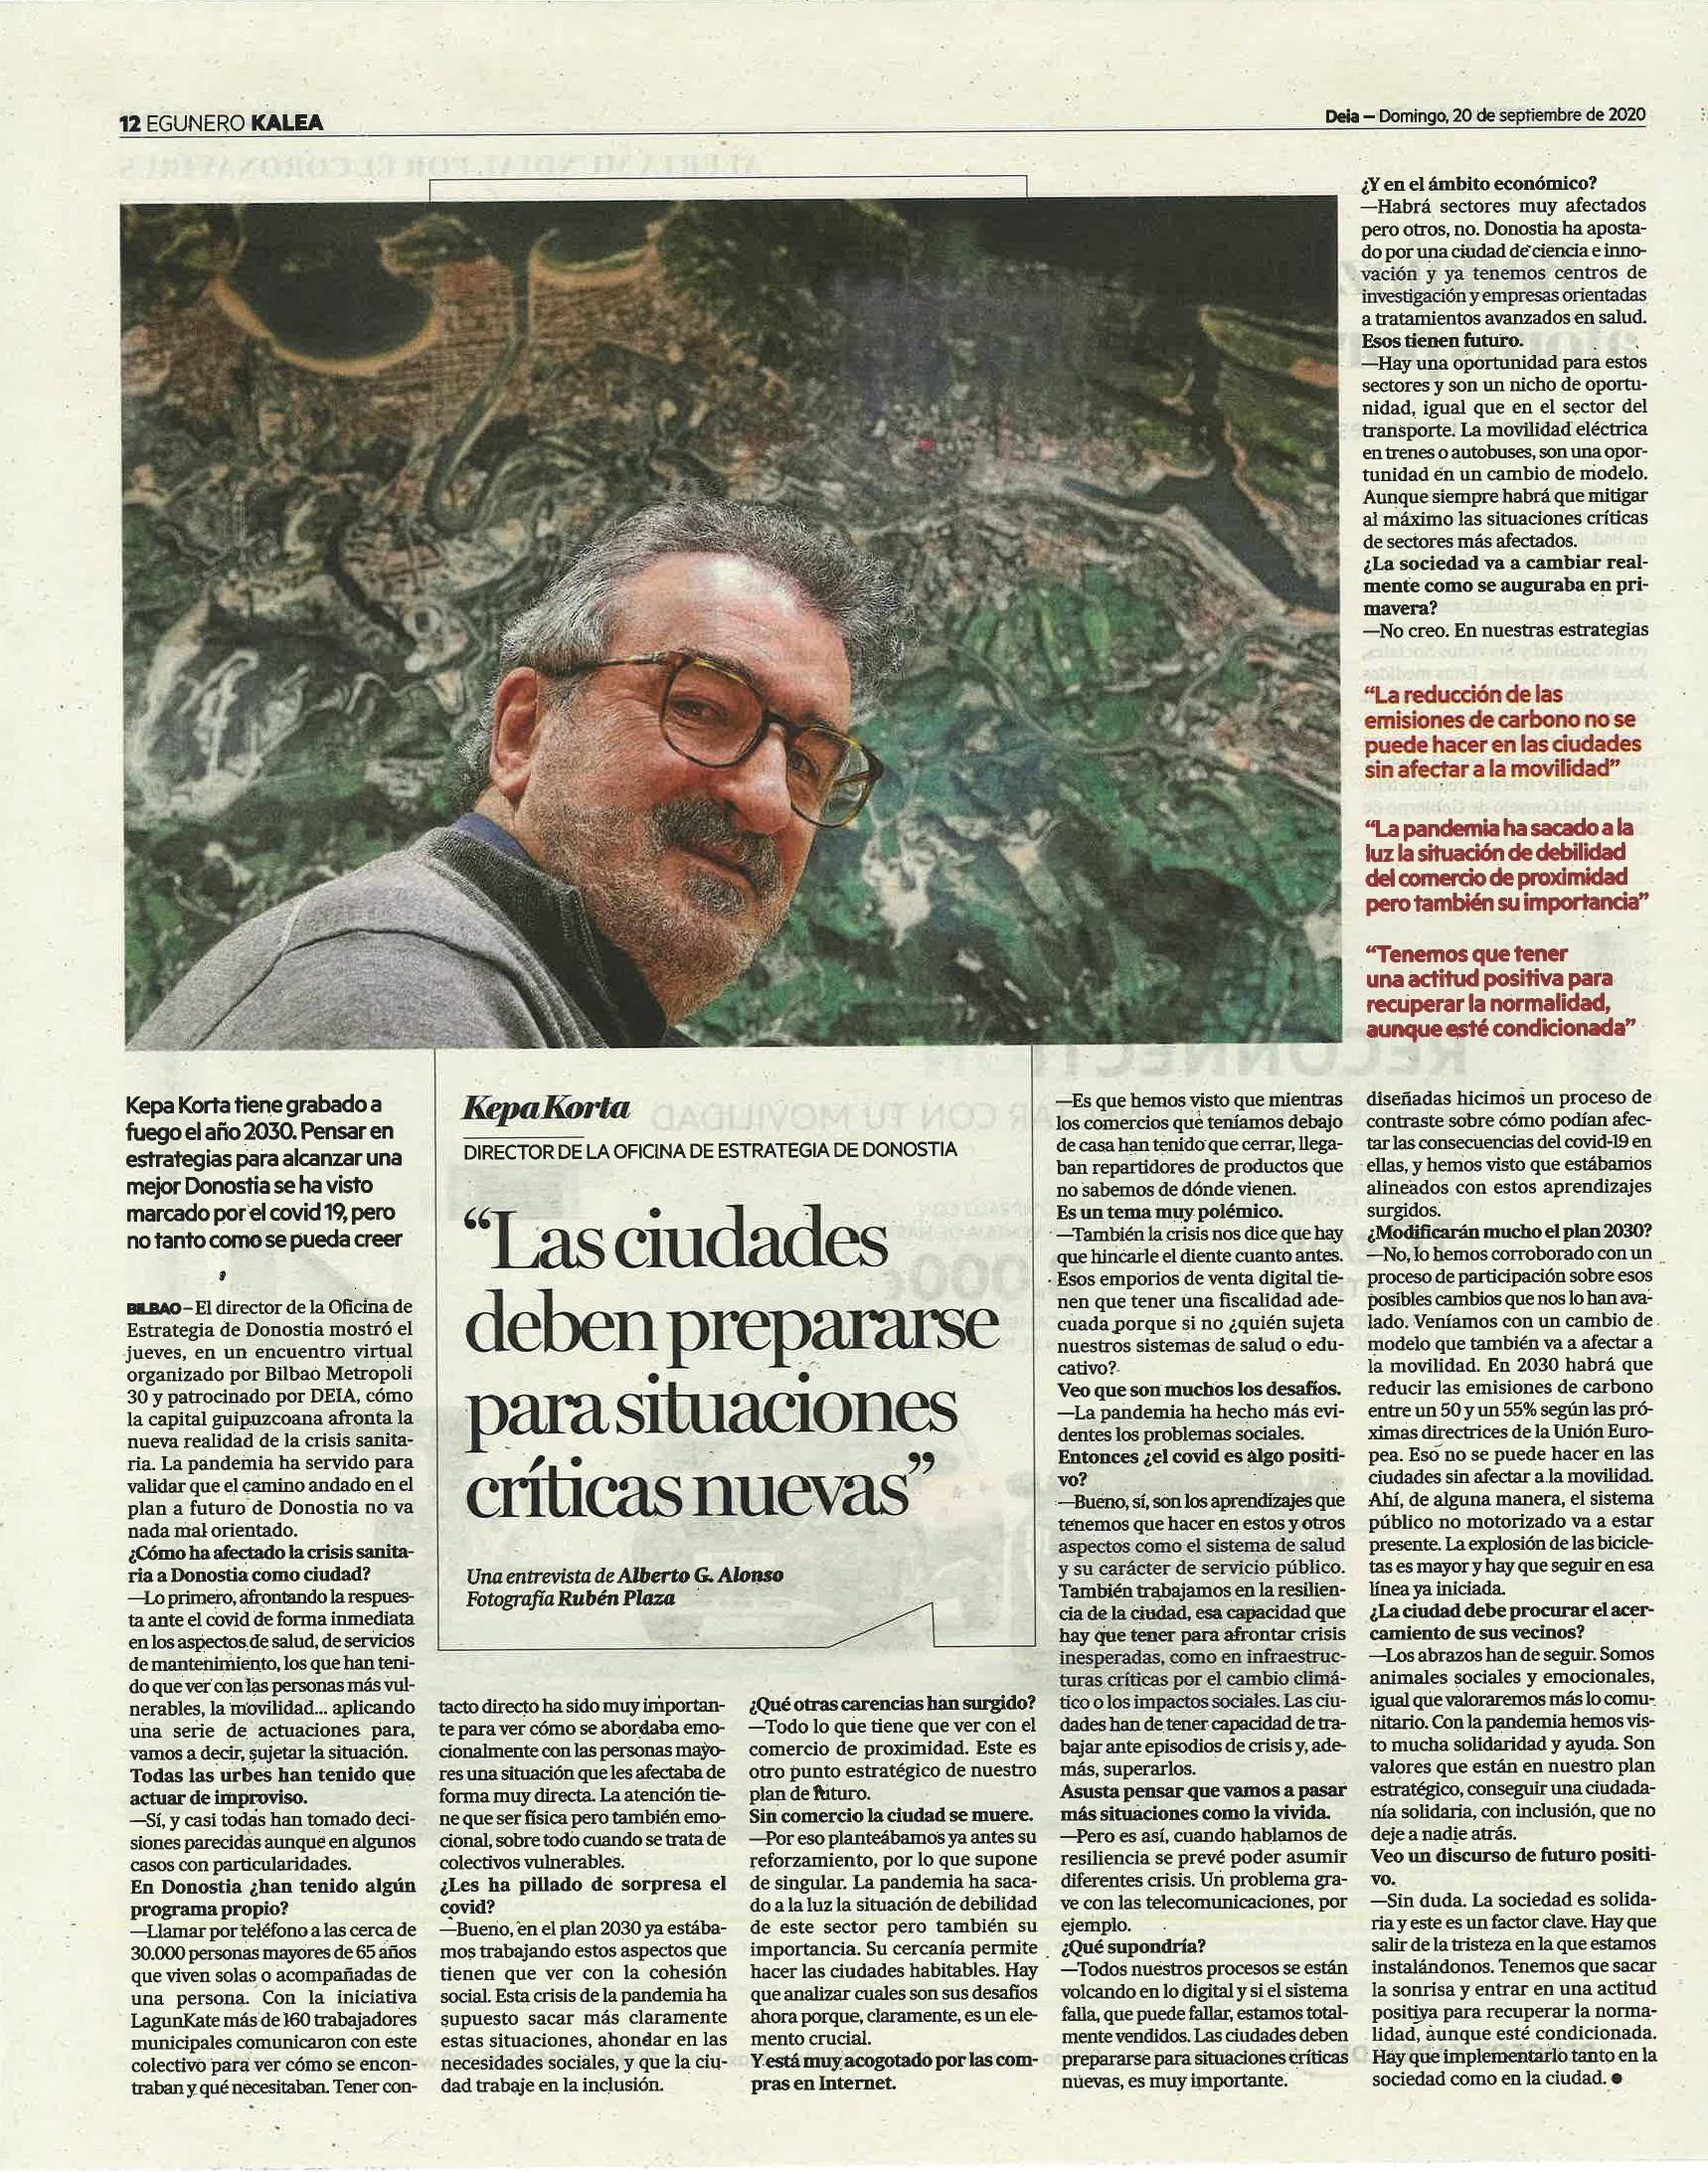 Entrevista a Kepa Korta, director de la Oficina de Estrategia de Donostia / San Sebastián